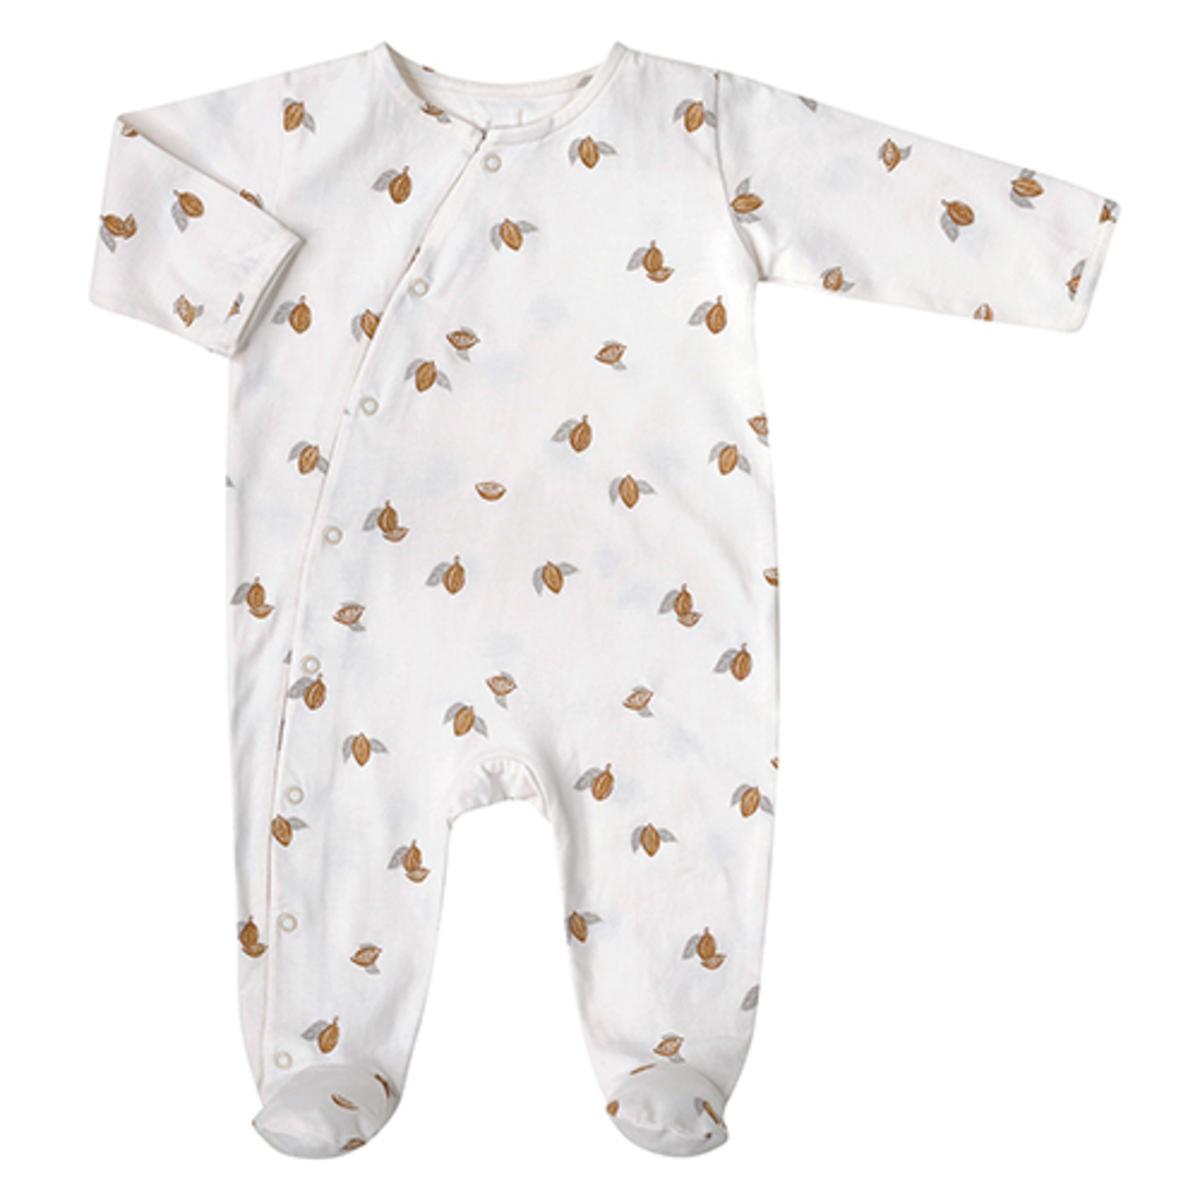 Body & Pyjama Combinaison Jour et Nuit Tonka - 6 Mois